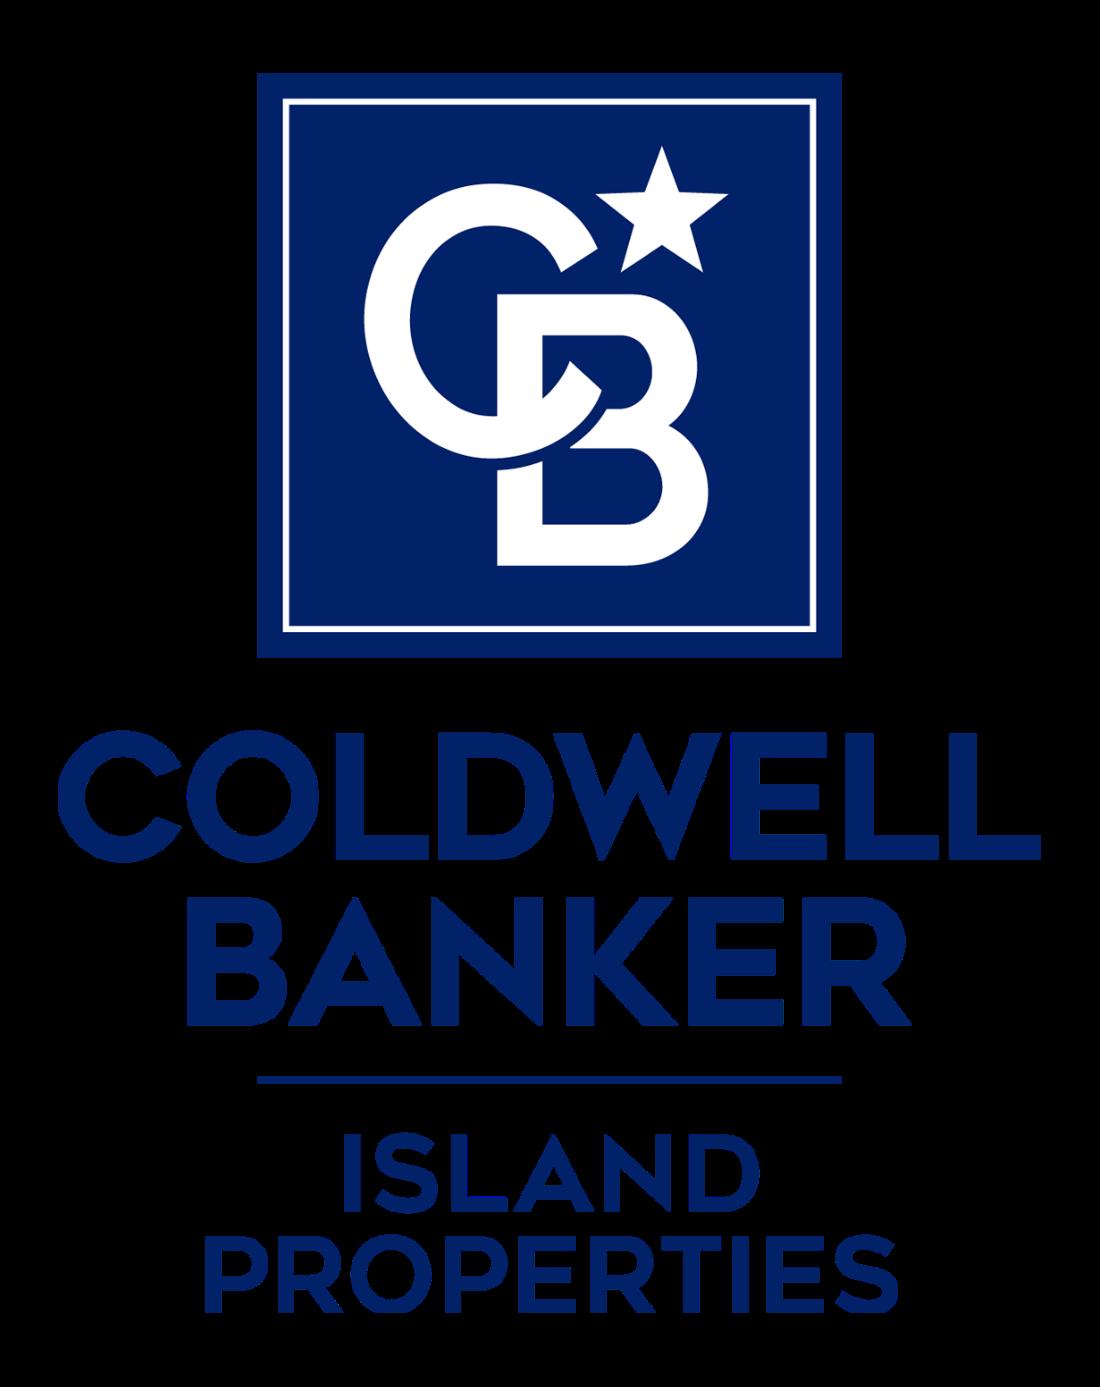 Michael Corella - Coldwell Banker Island Properties Logo